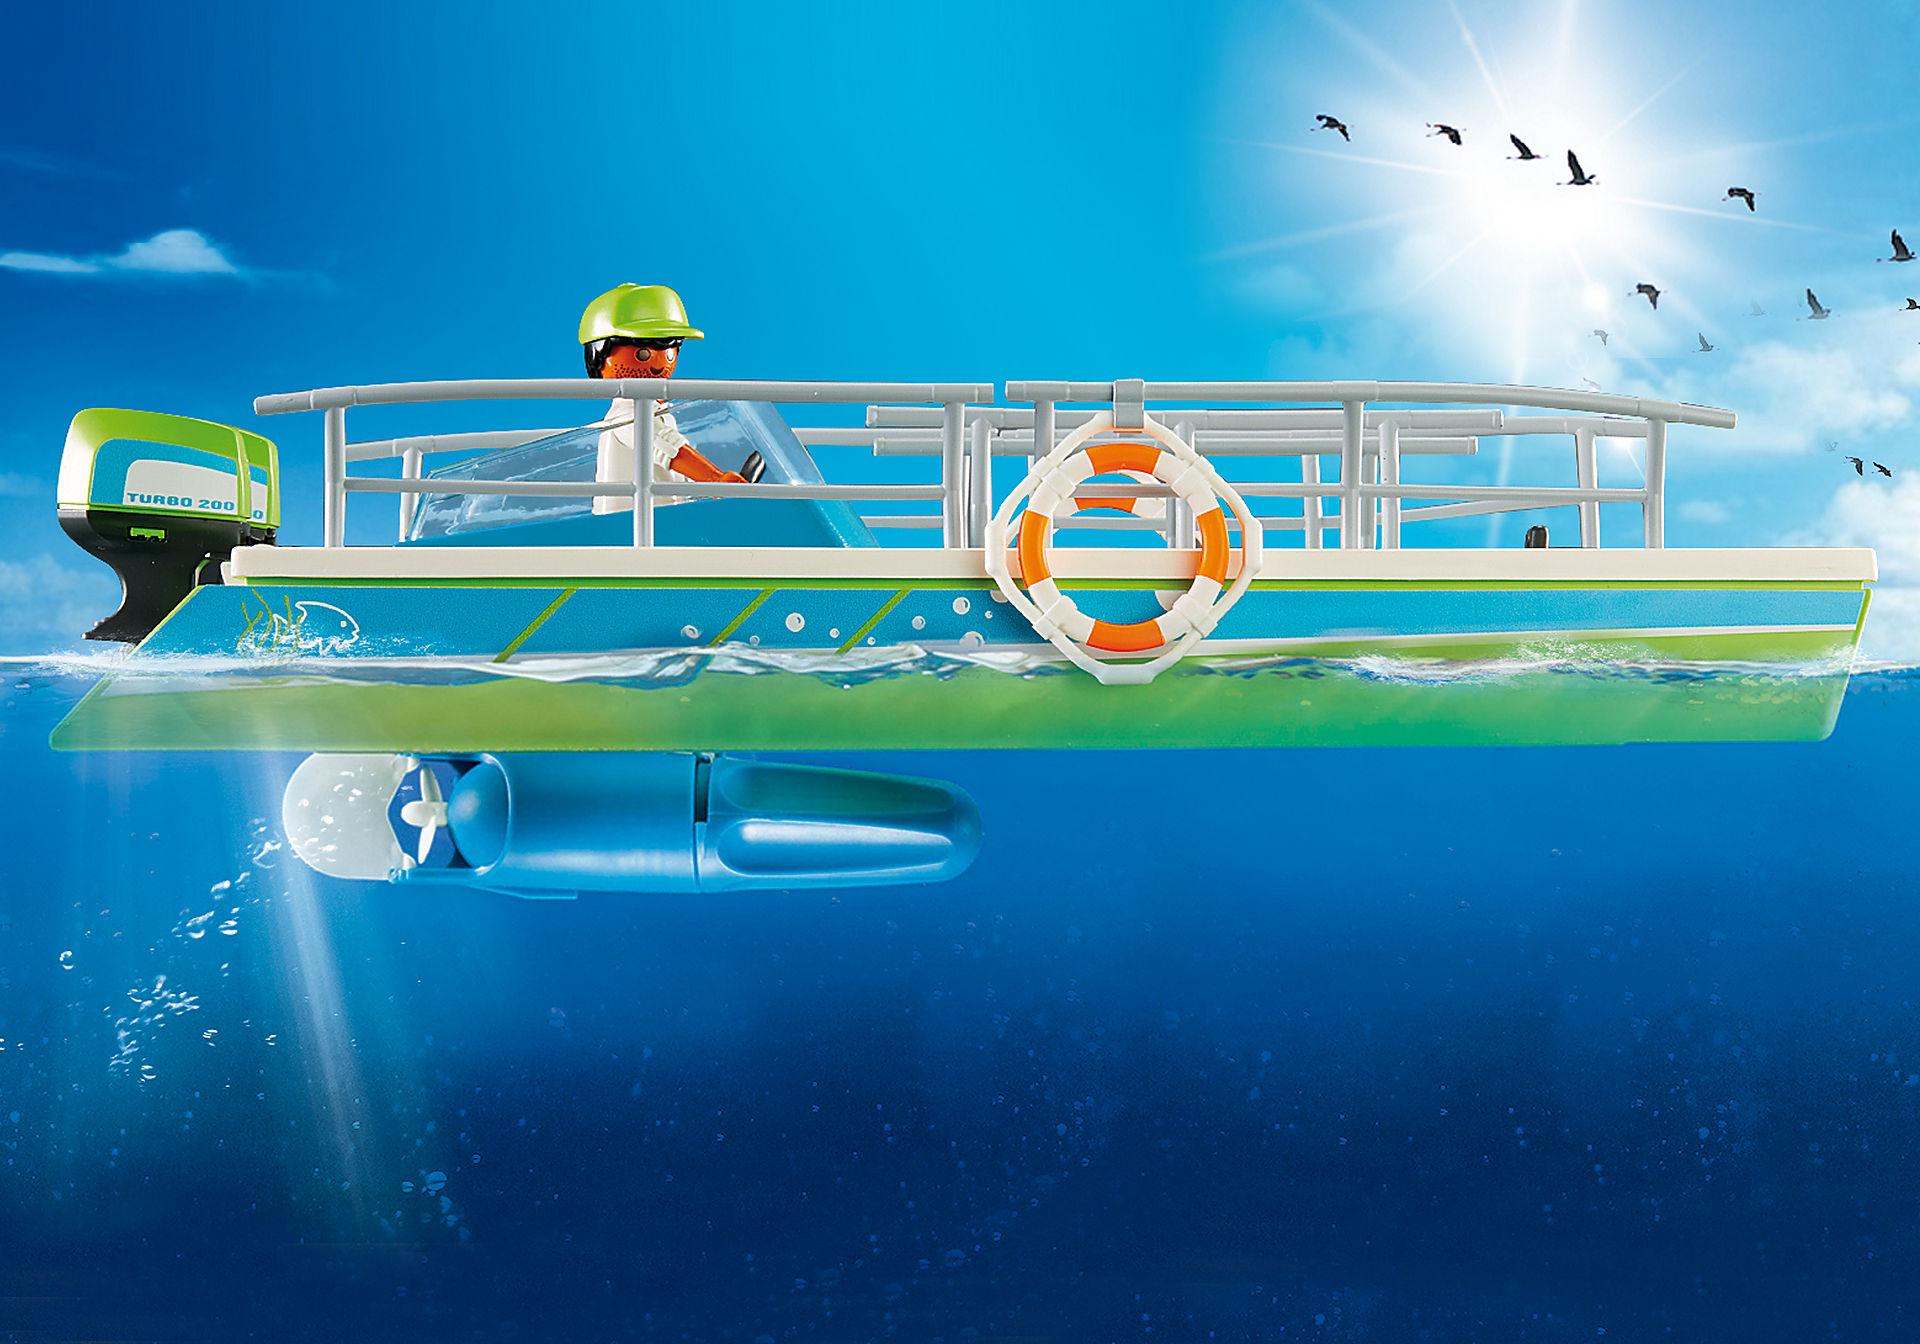 9233 Barco Vistas Fondo Marino con Motor Submarino  zoom image7